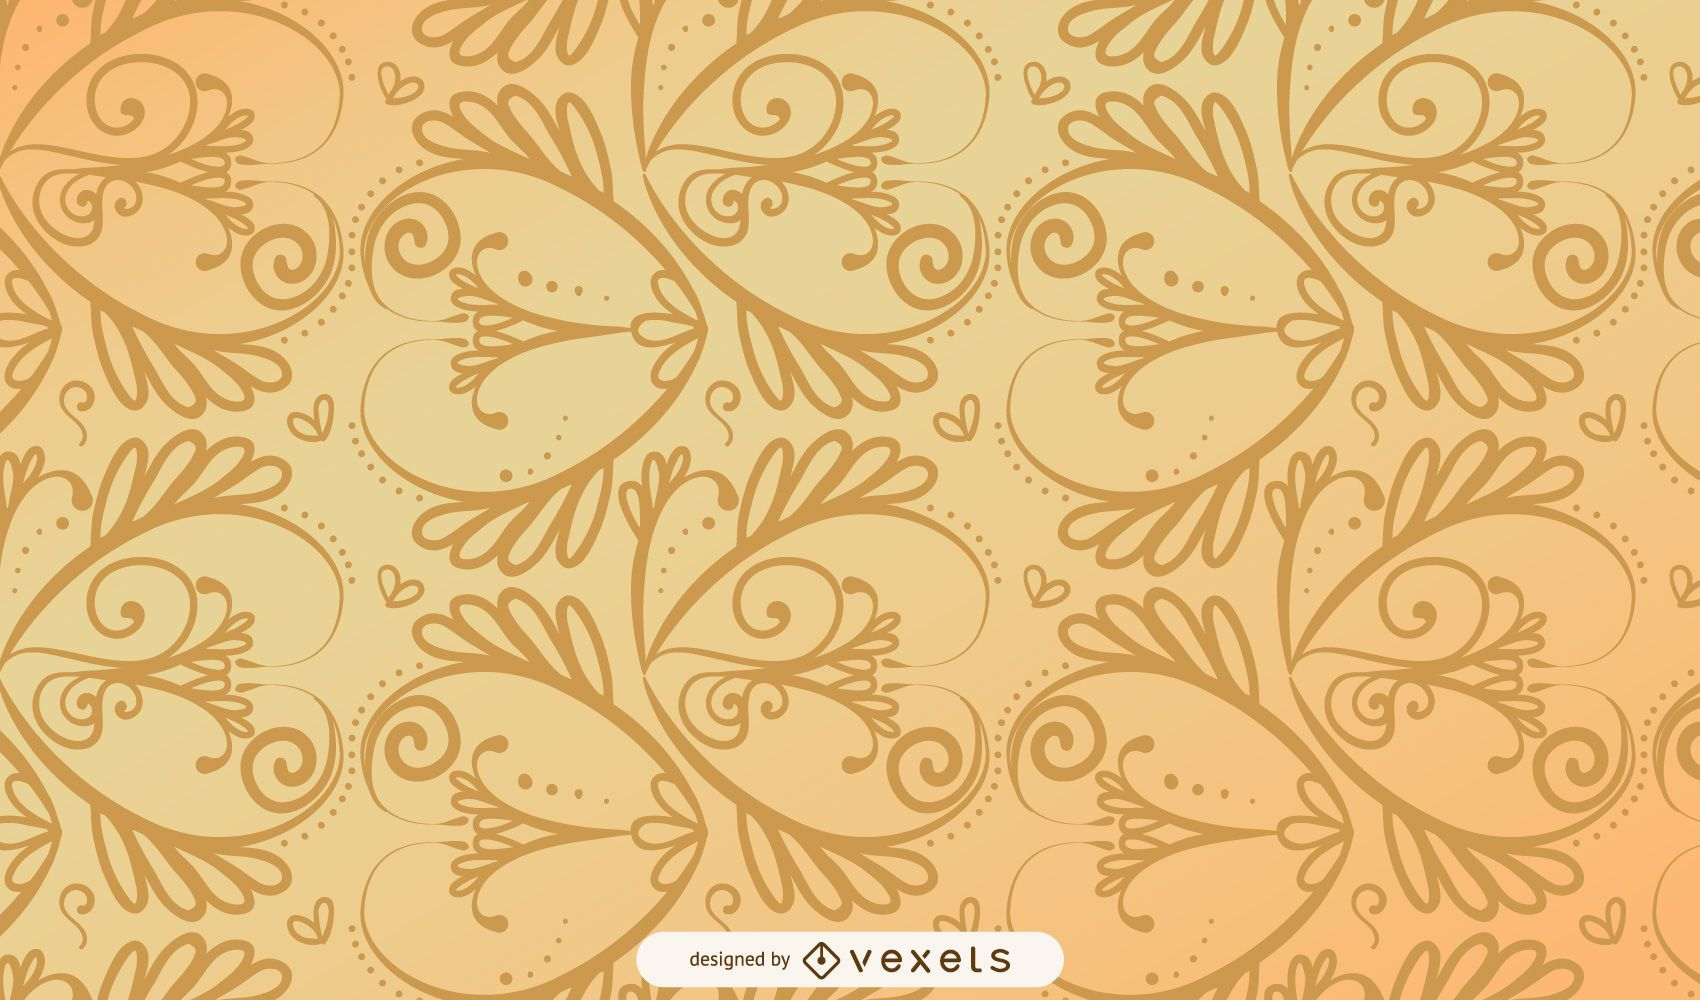 Seamless Spiral Golden Vintage Pattern